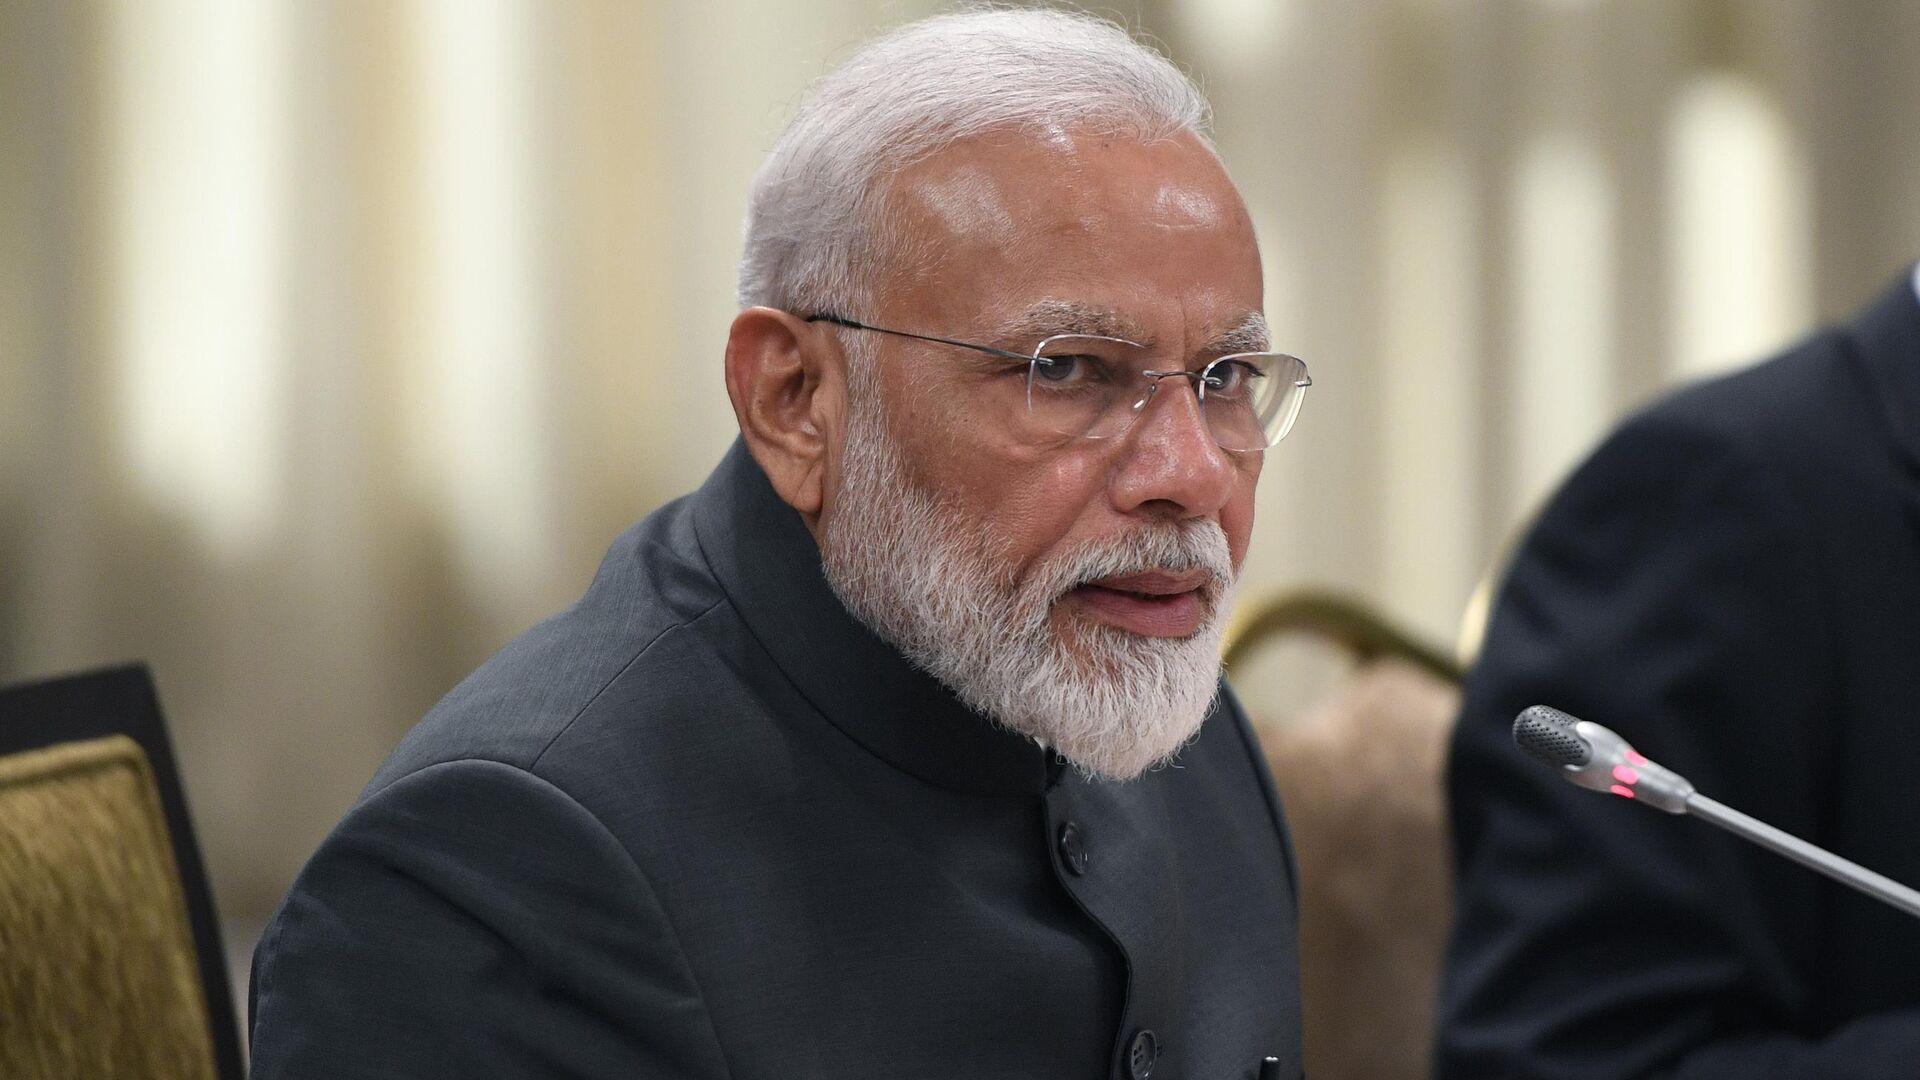 Премьер-министр Индии Нарендра Моди - РИА Новости, 1920, 26.08.2019